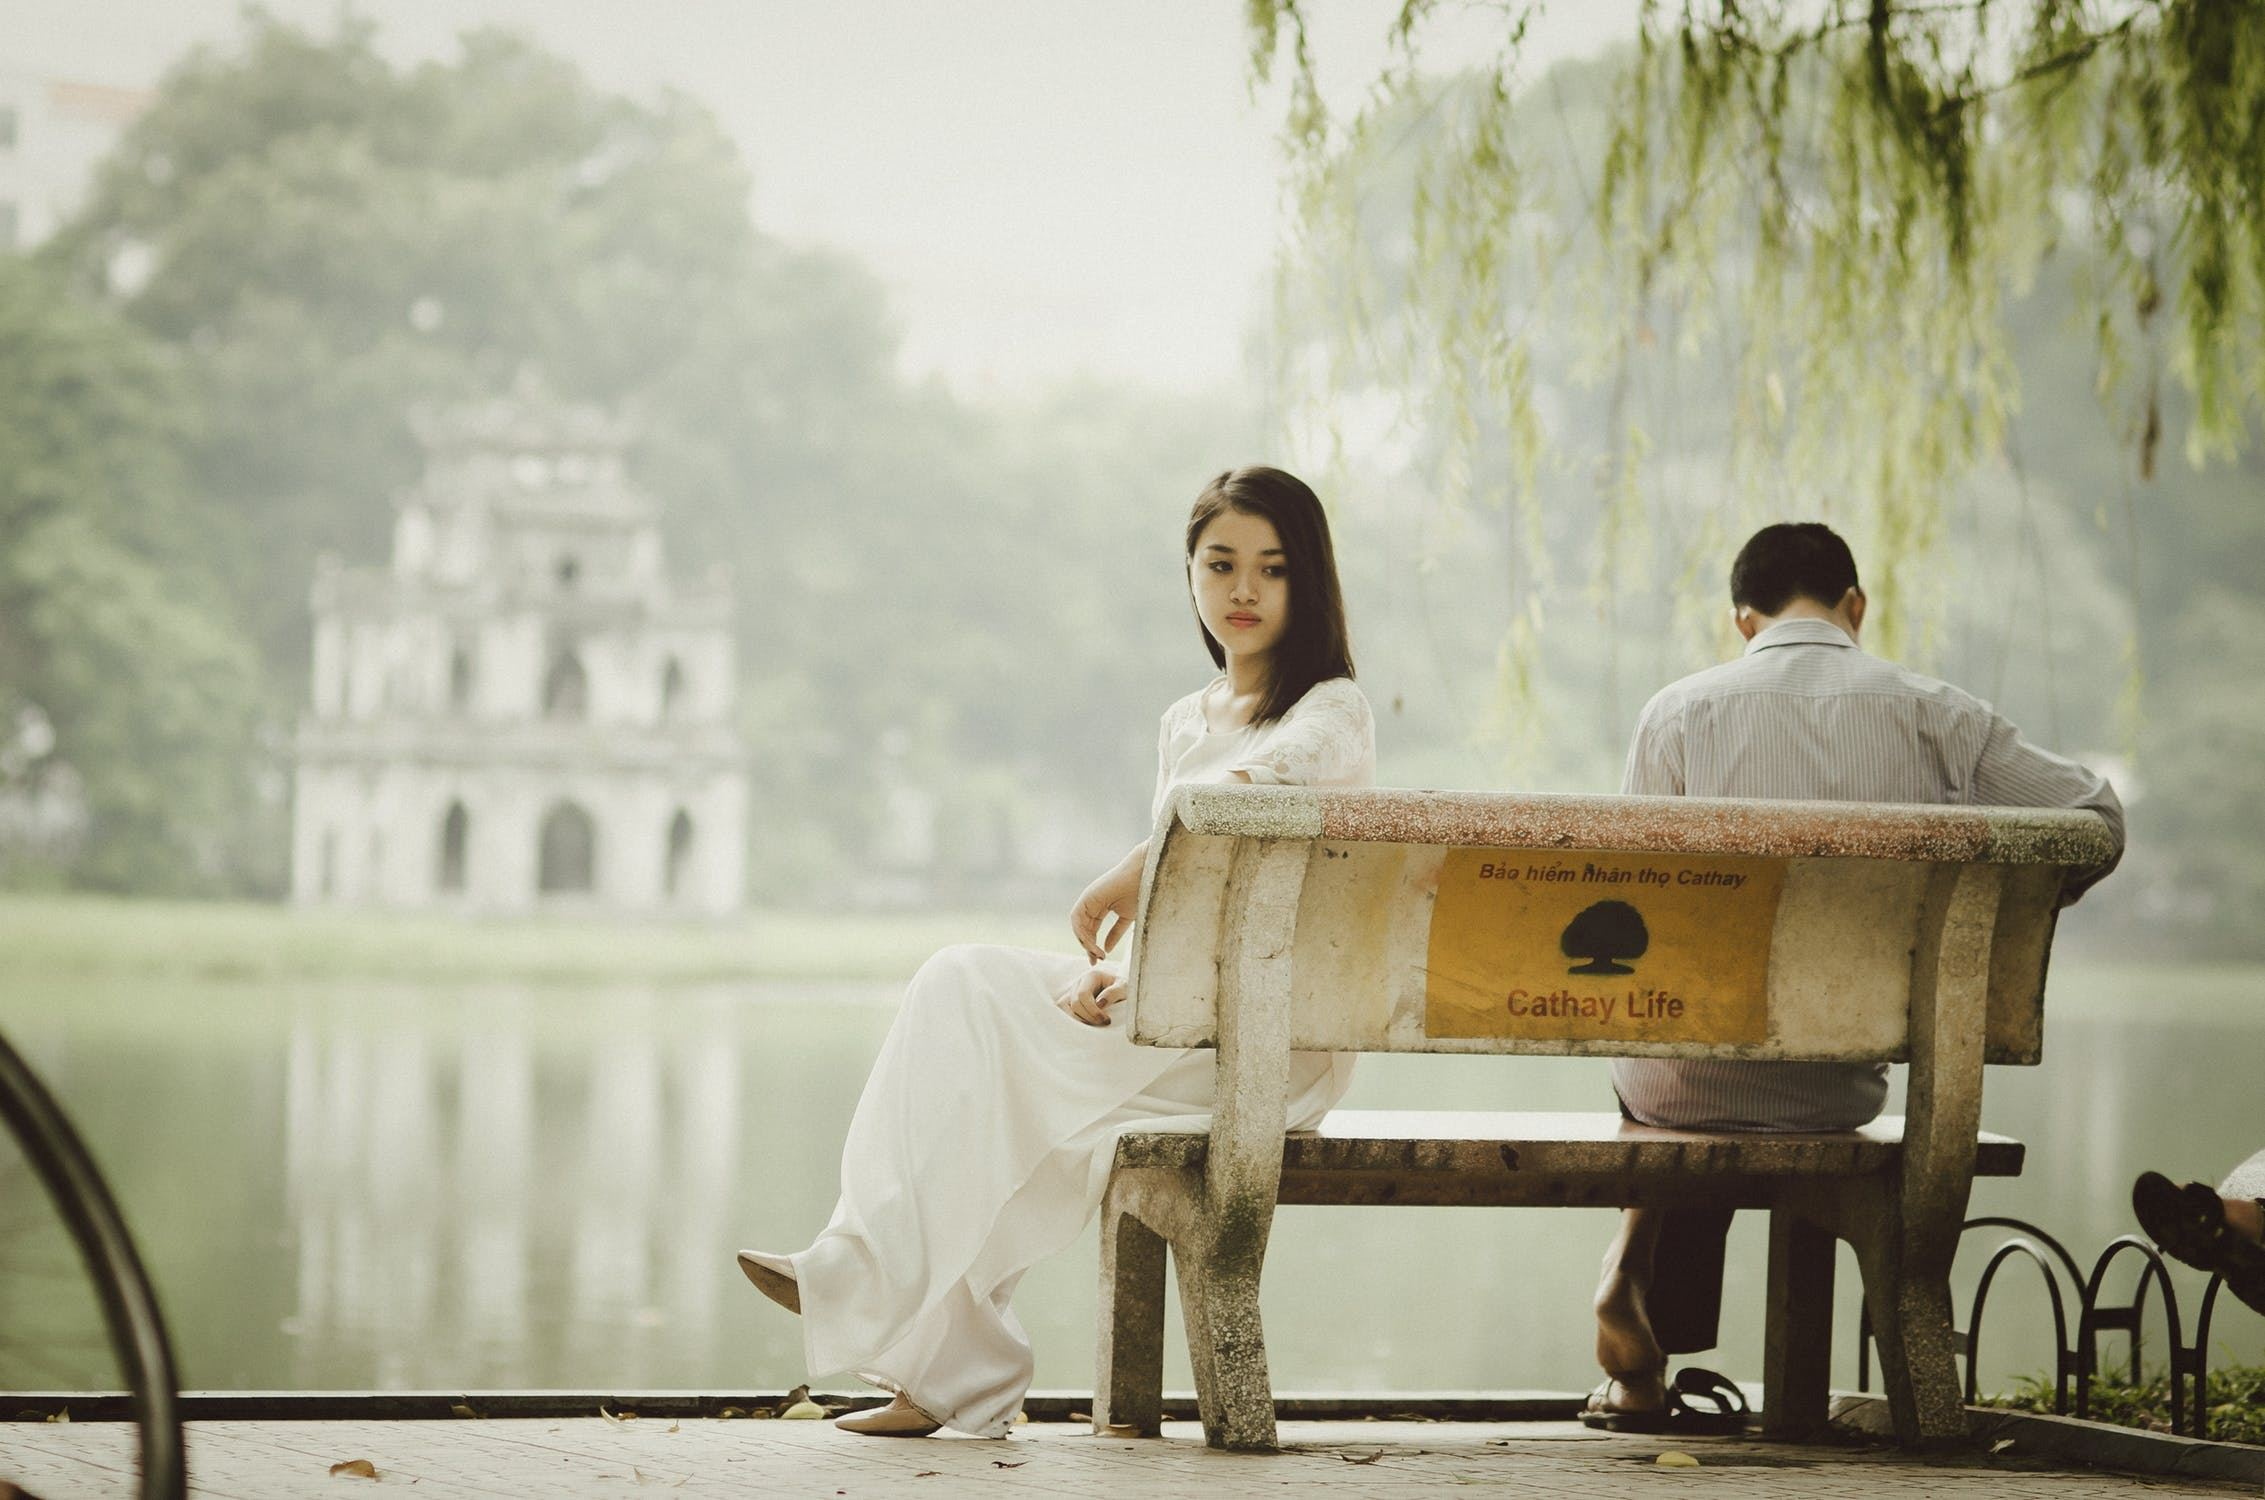 anda hidap sindrom ini jika rasa di cintai orang yang tidak mencintai anda